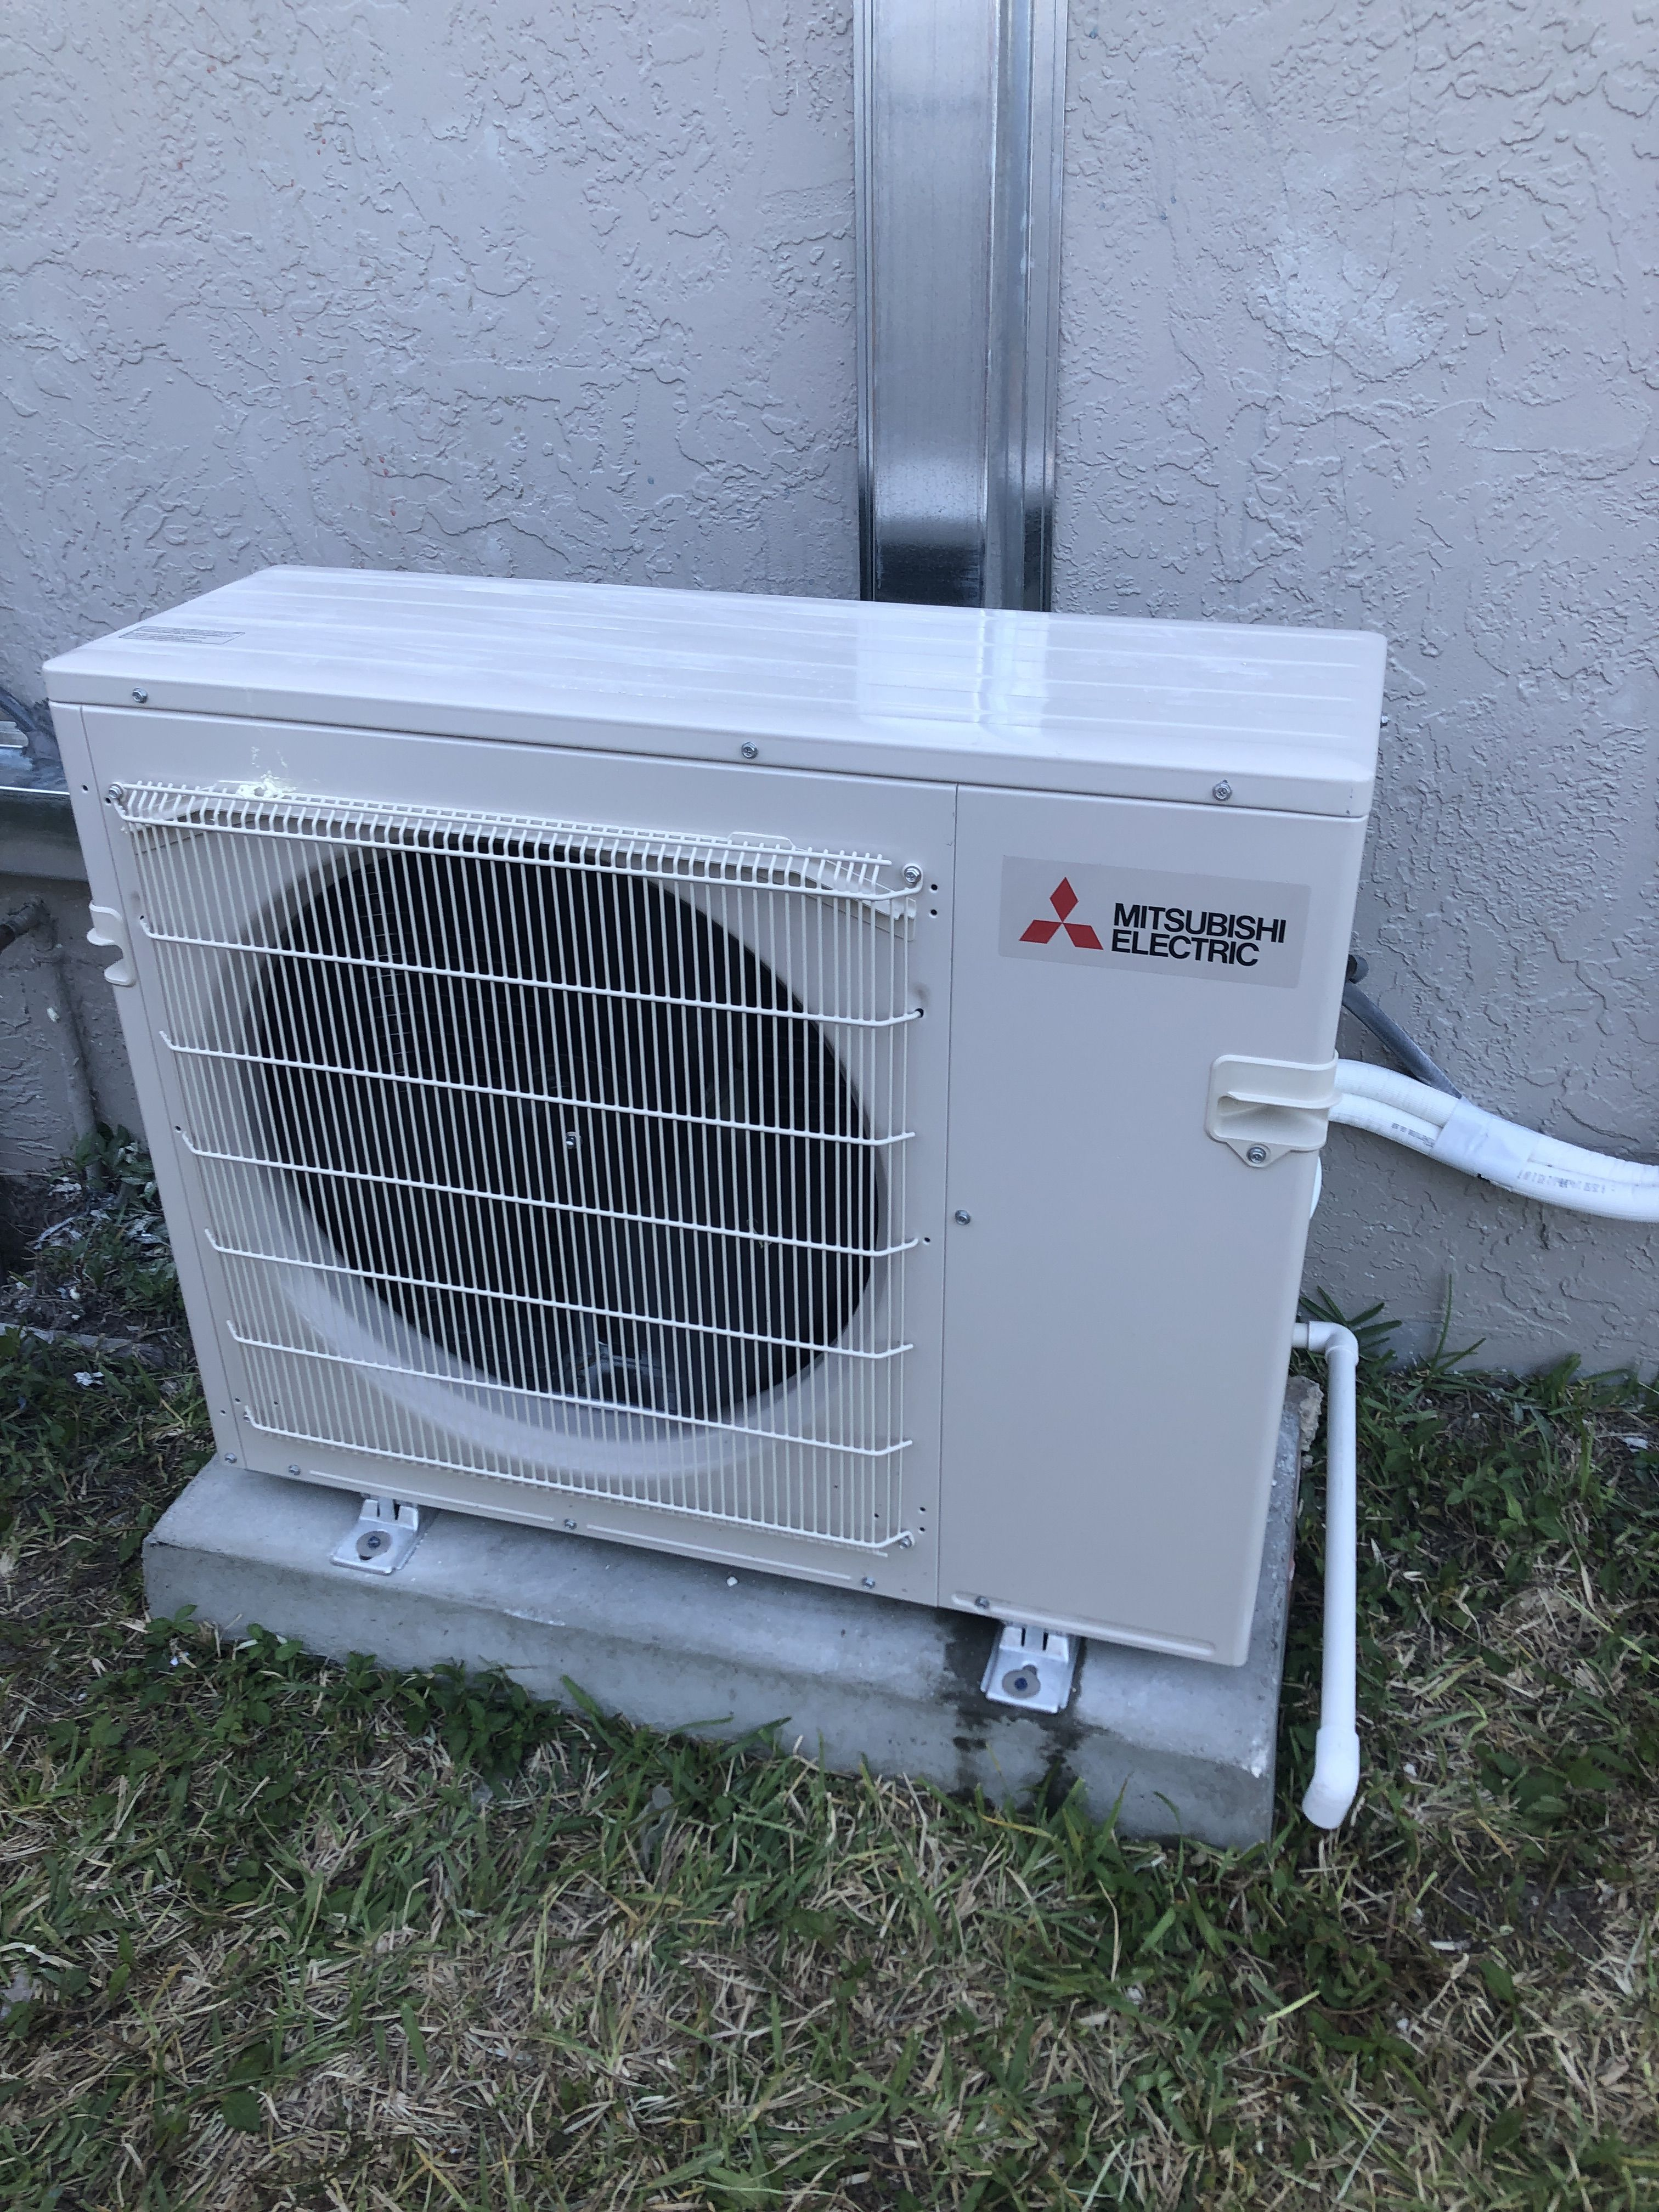 Mitsubishi Ductless mini split installation air